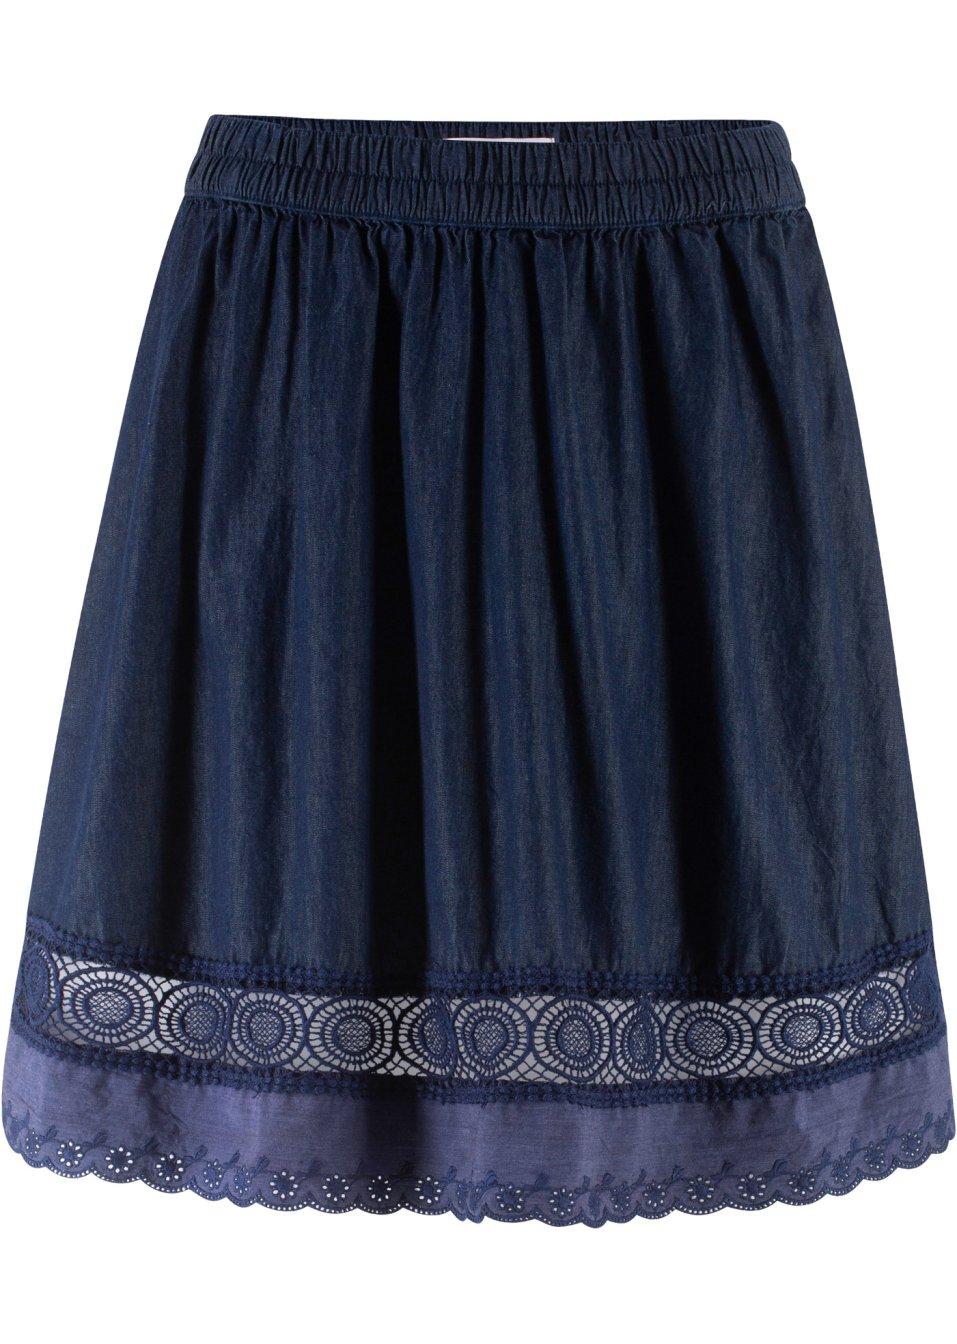 Jeansrock mit Gummizug und Spitze dunkelblau - Damen - bonprix.de 5n5j5 N5iwW